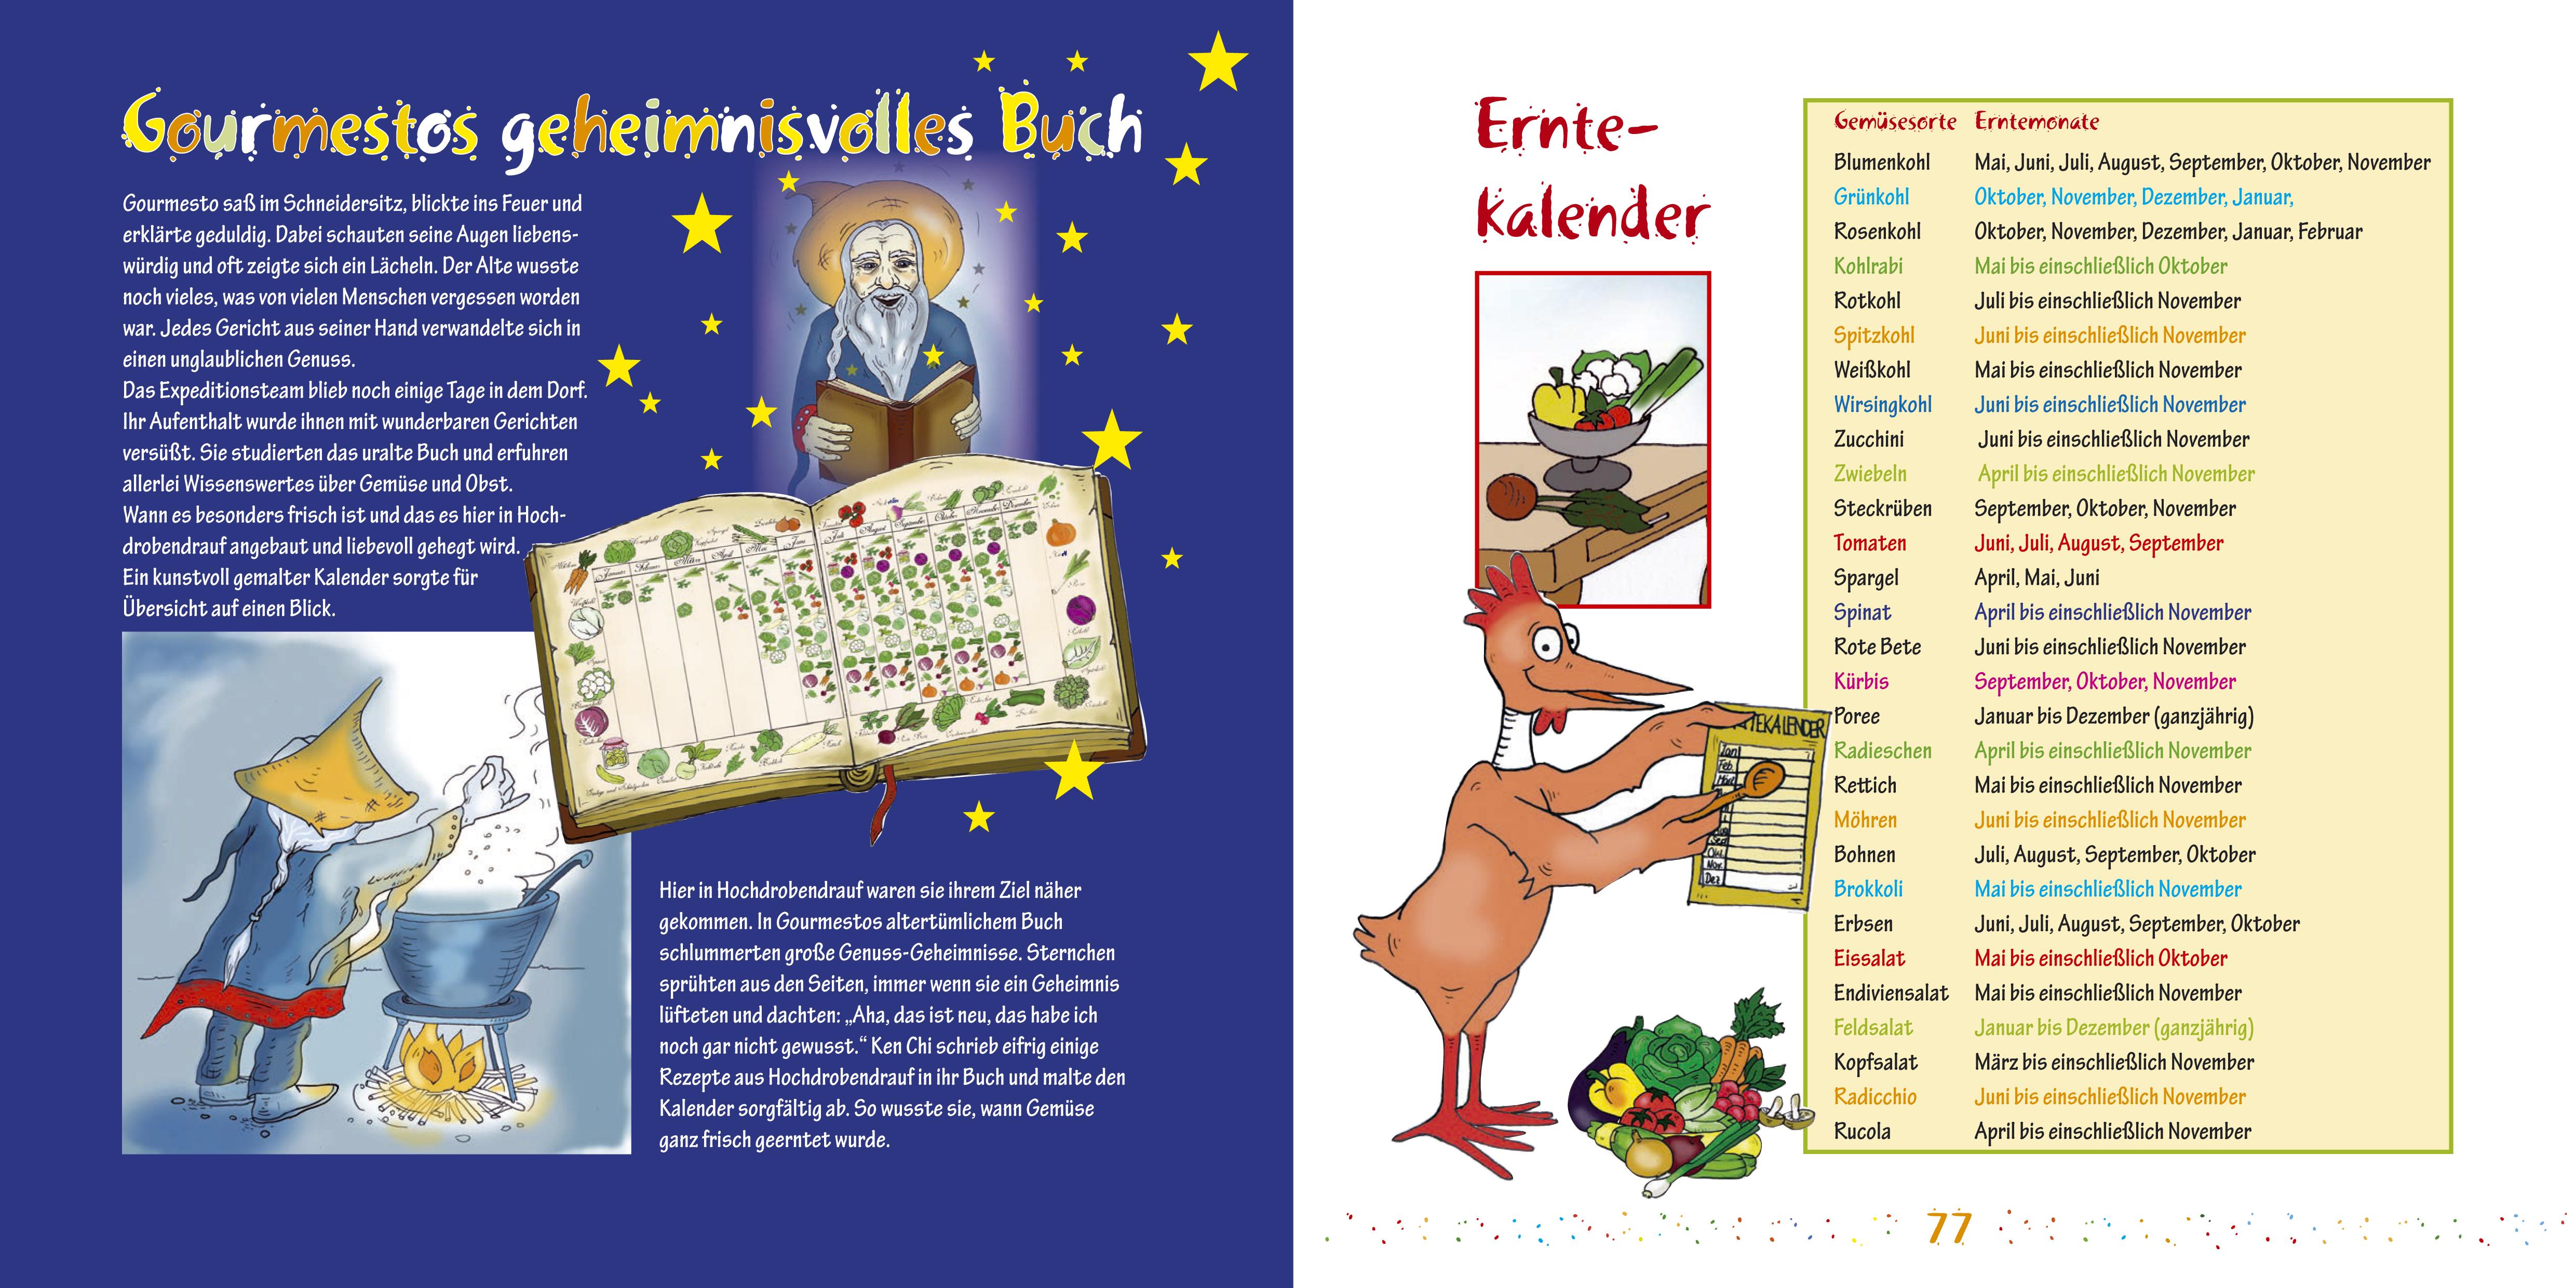 Erntekalender